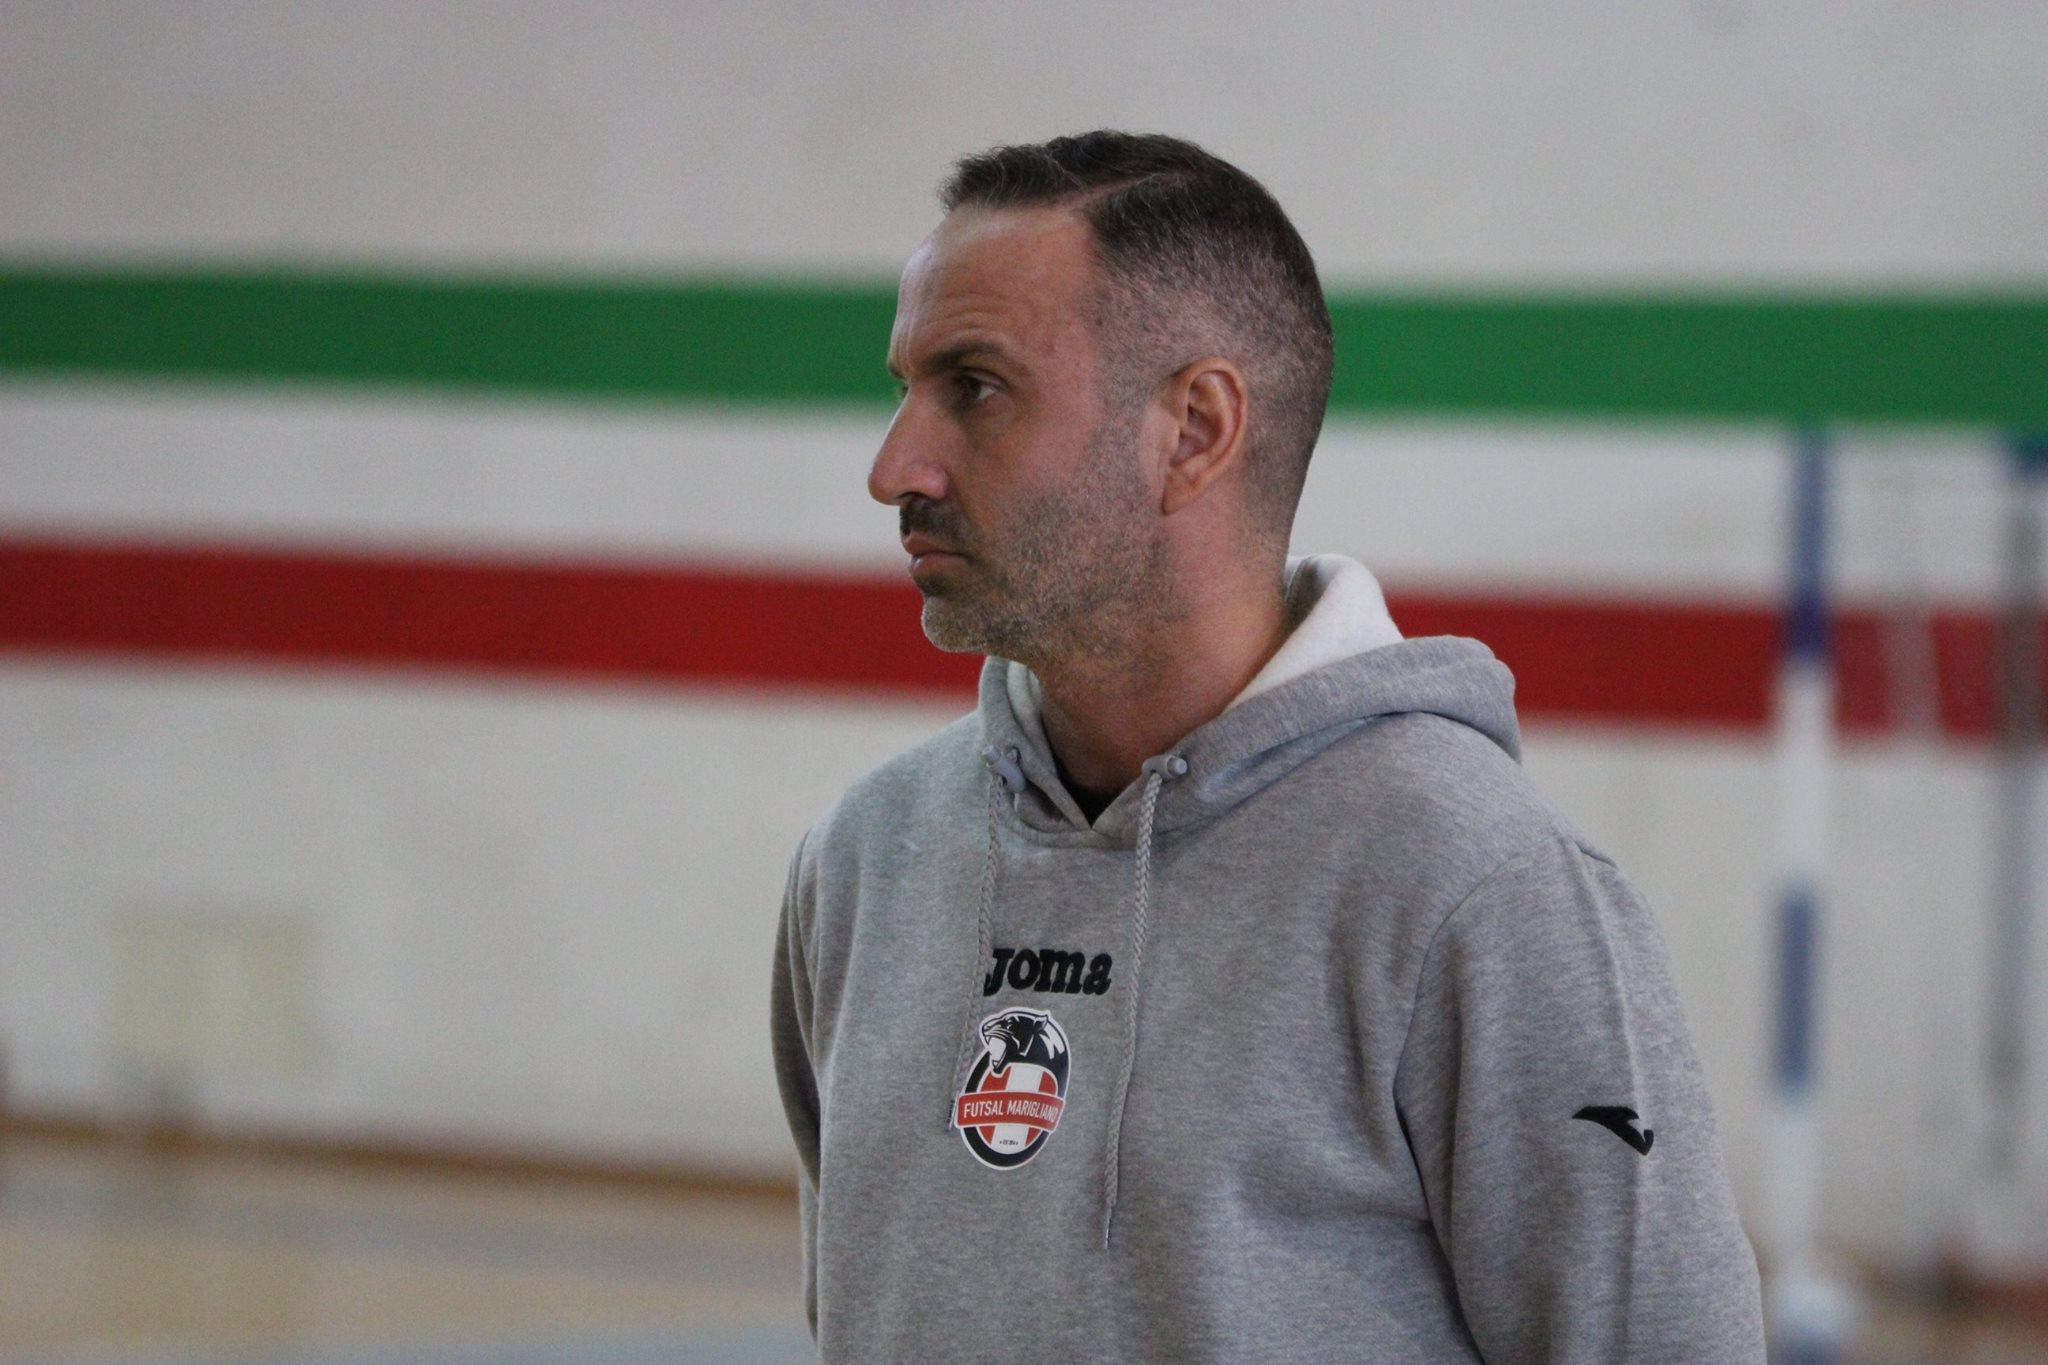 Fabio Oliva